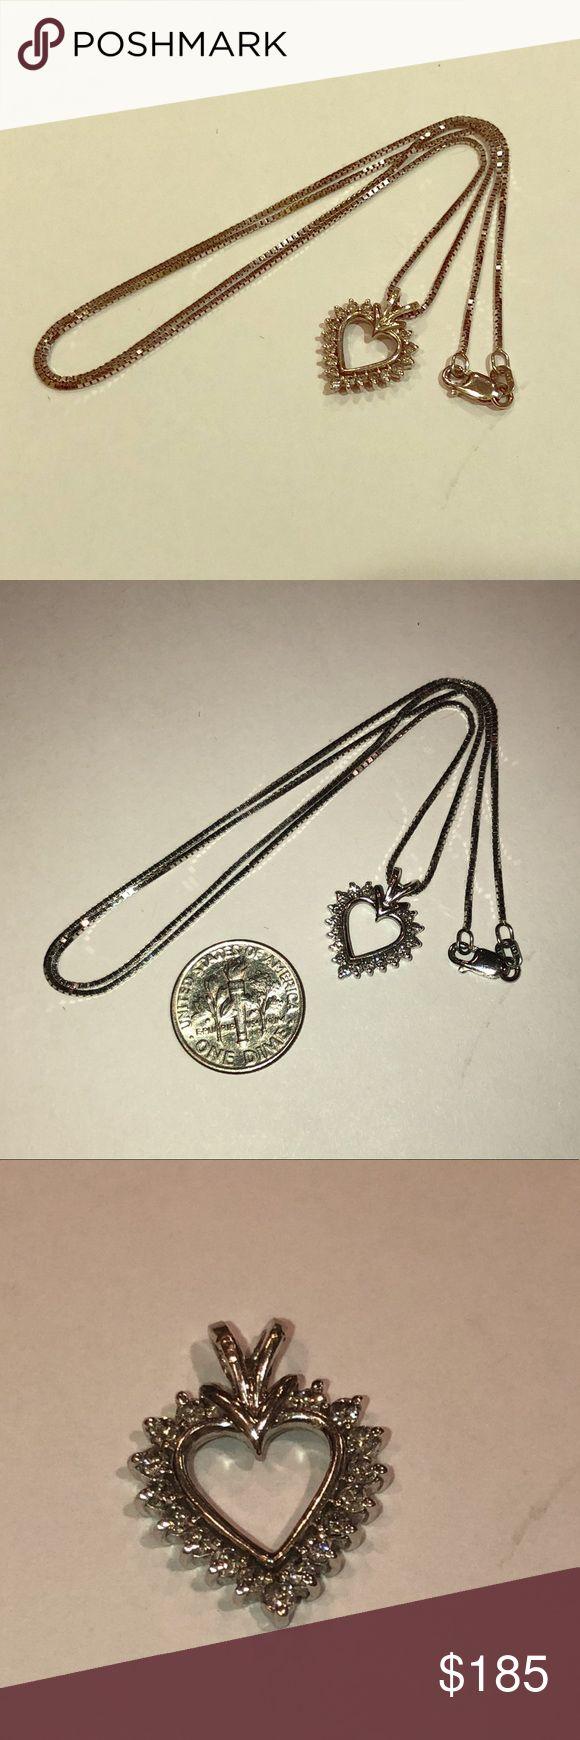 14k Gold Chain & 10k Heart Pendant Diamonds Pre-loved pieces 14k white gold chain plus 10k gold heart with real diamonds. Jewelry Necklaces